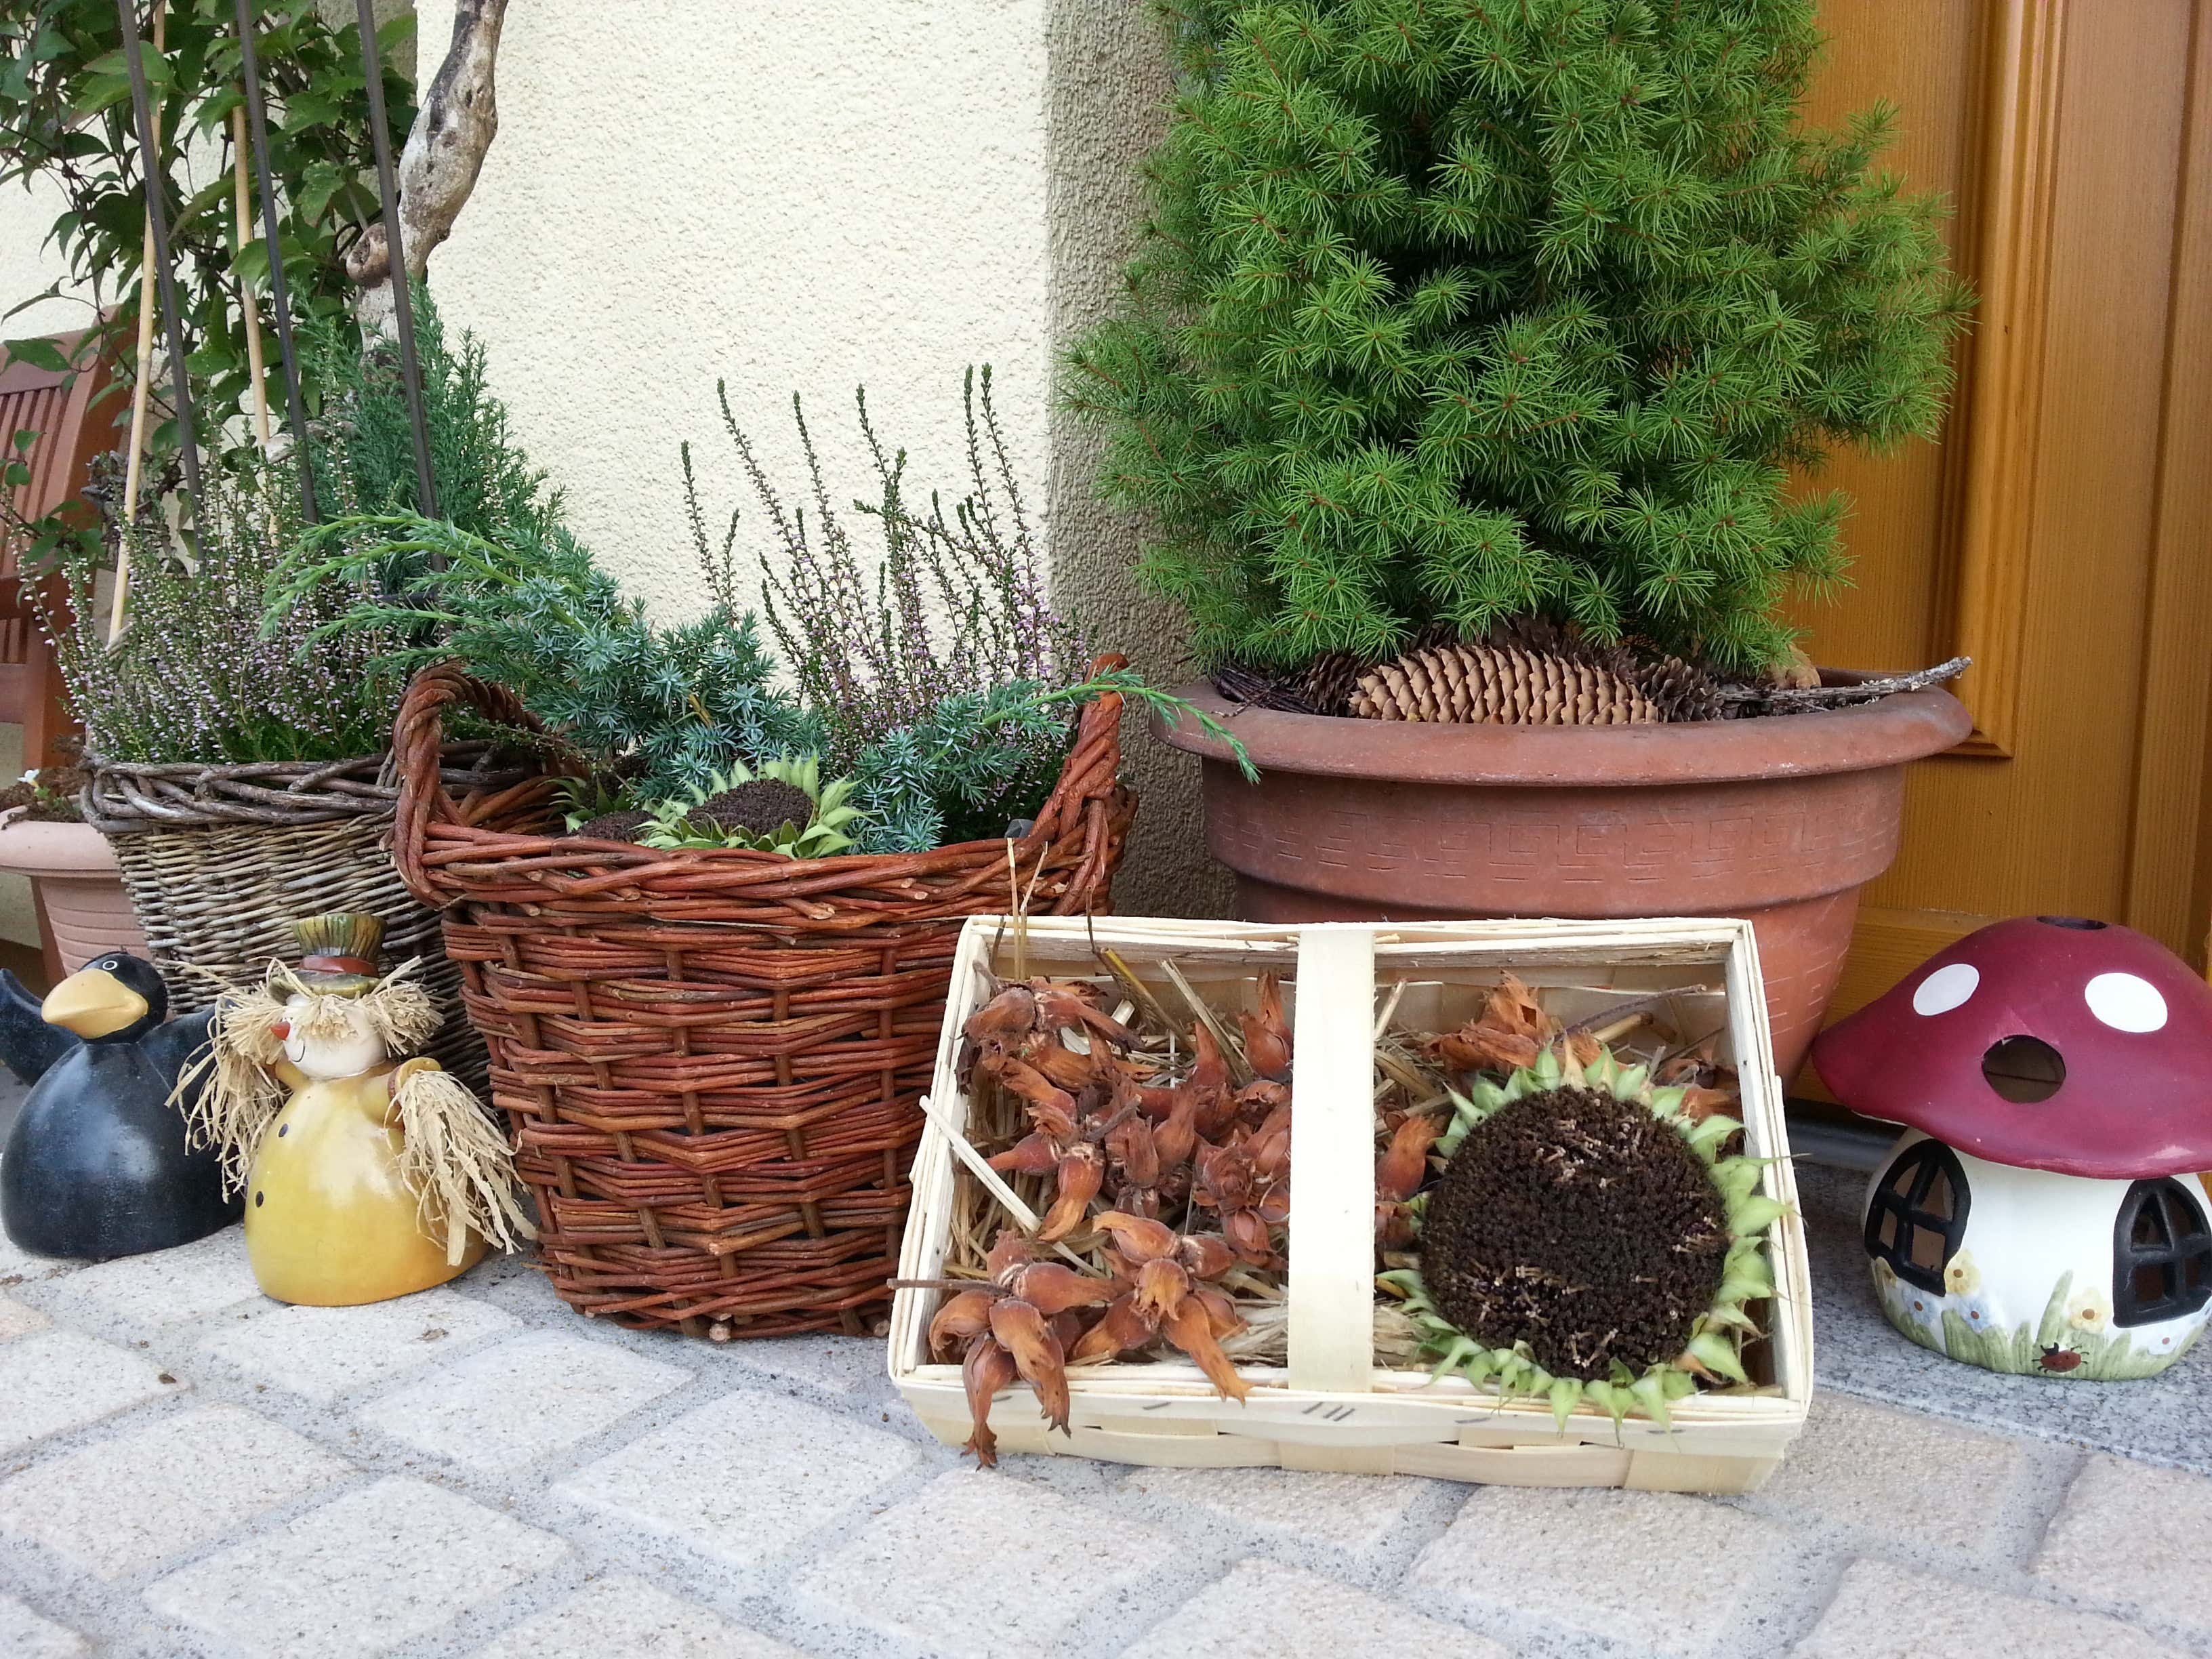 Herbstdeko ideen kreativ bunt den garten dekorieren for Gartendeko bilder